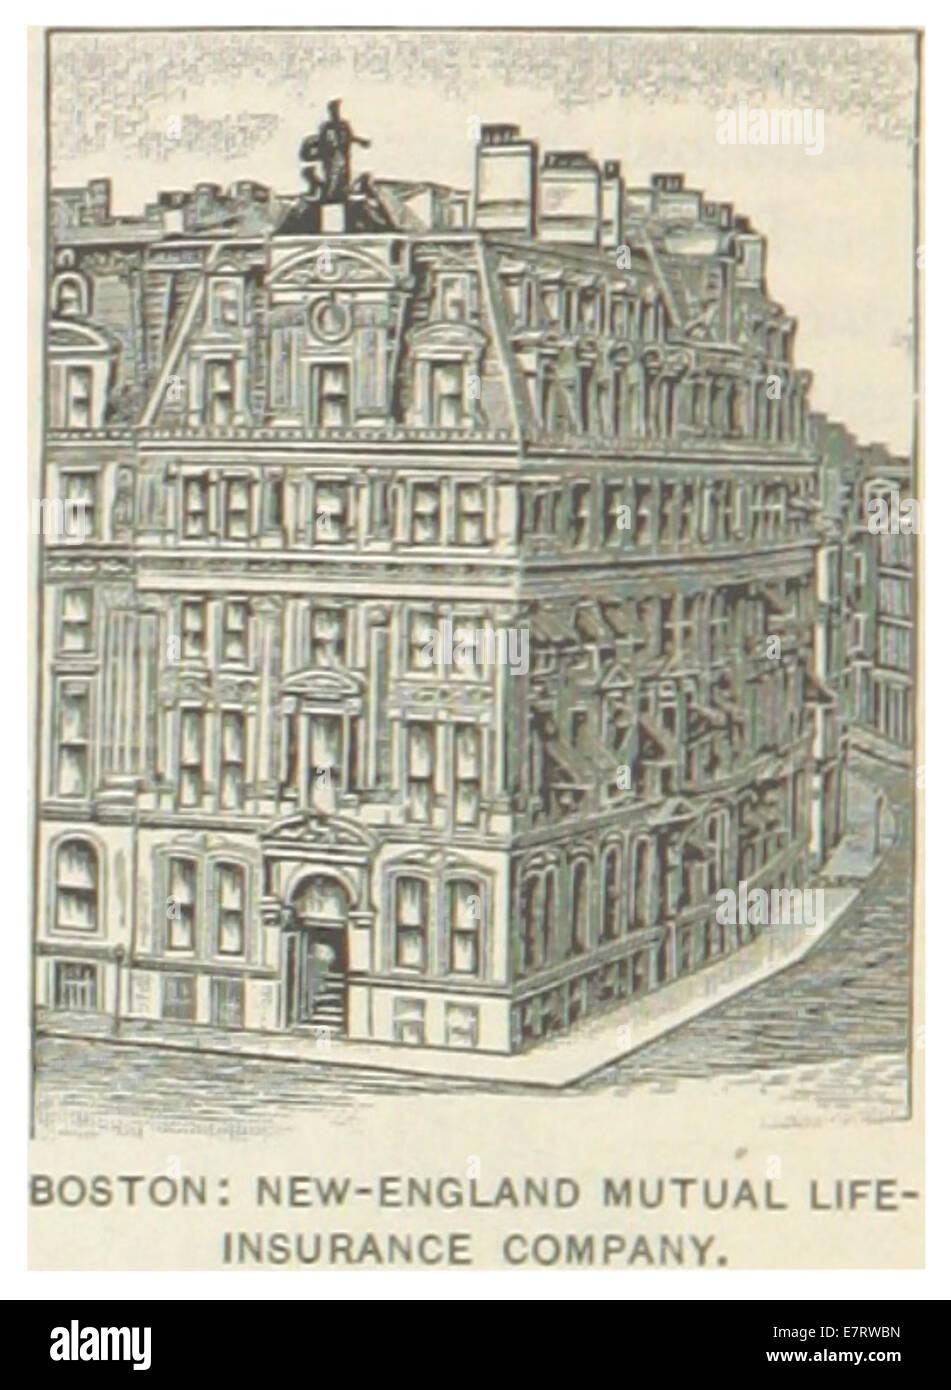 new england mutual life insurance company US-MA(1891) p372 BOSTON, NEW-ENGLAND MUTUAL LIFE INSURANCE COMPANY ...